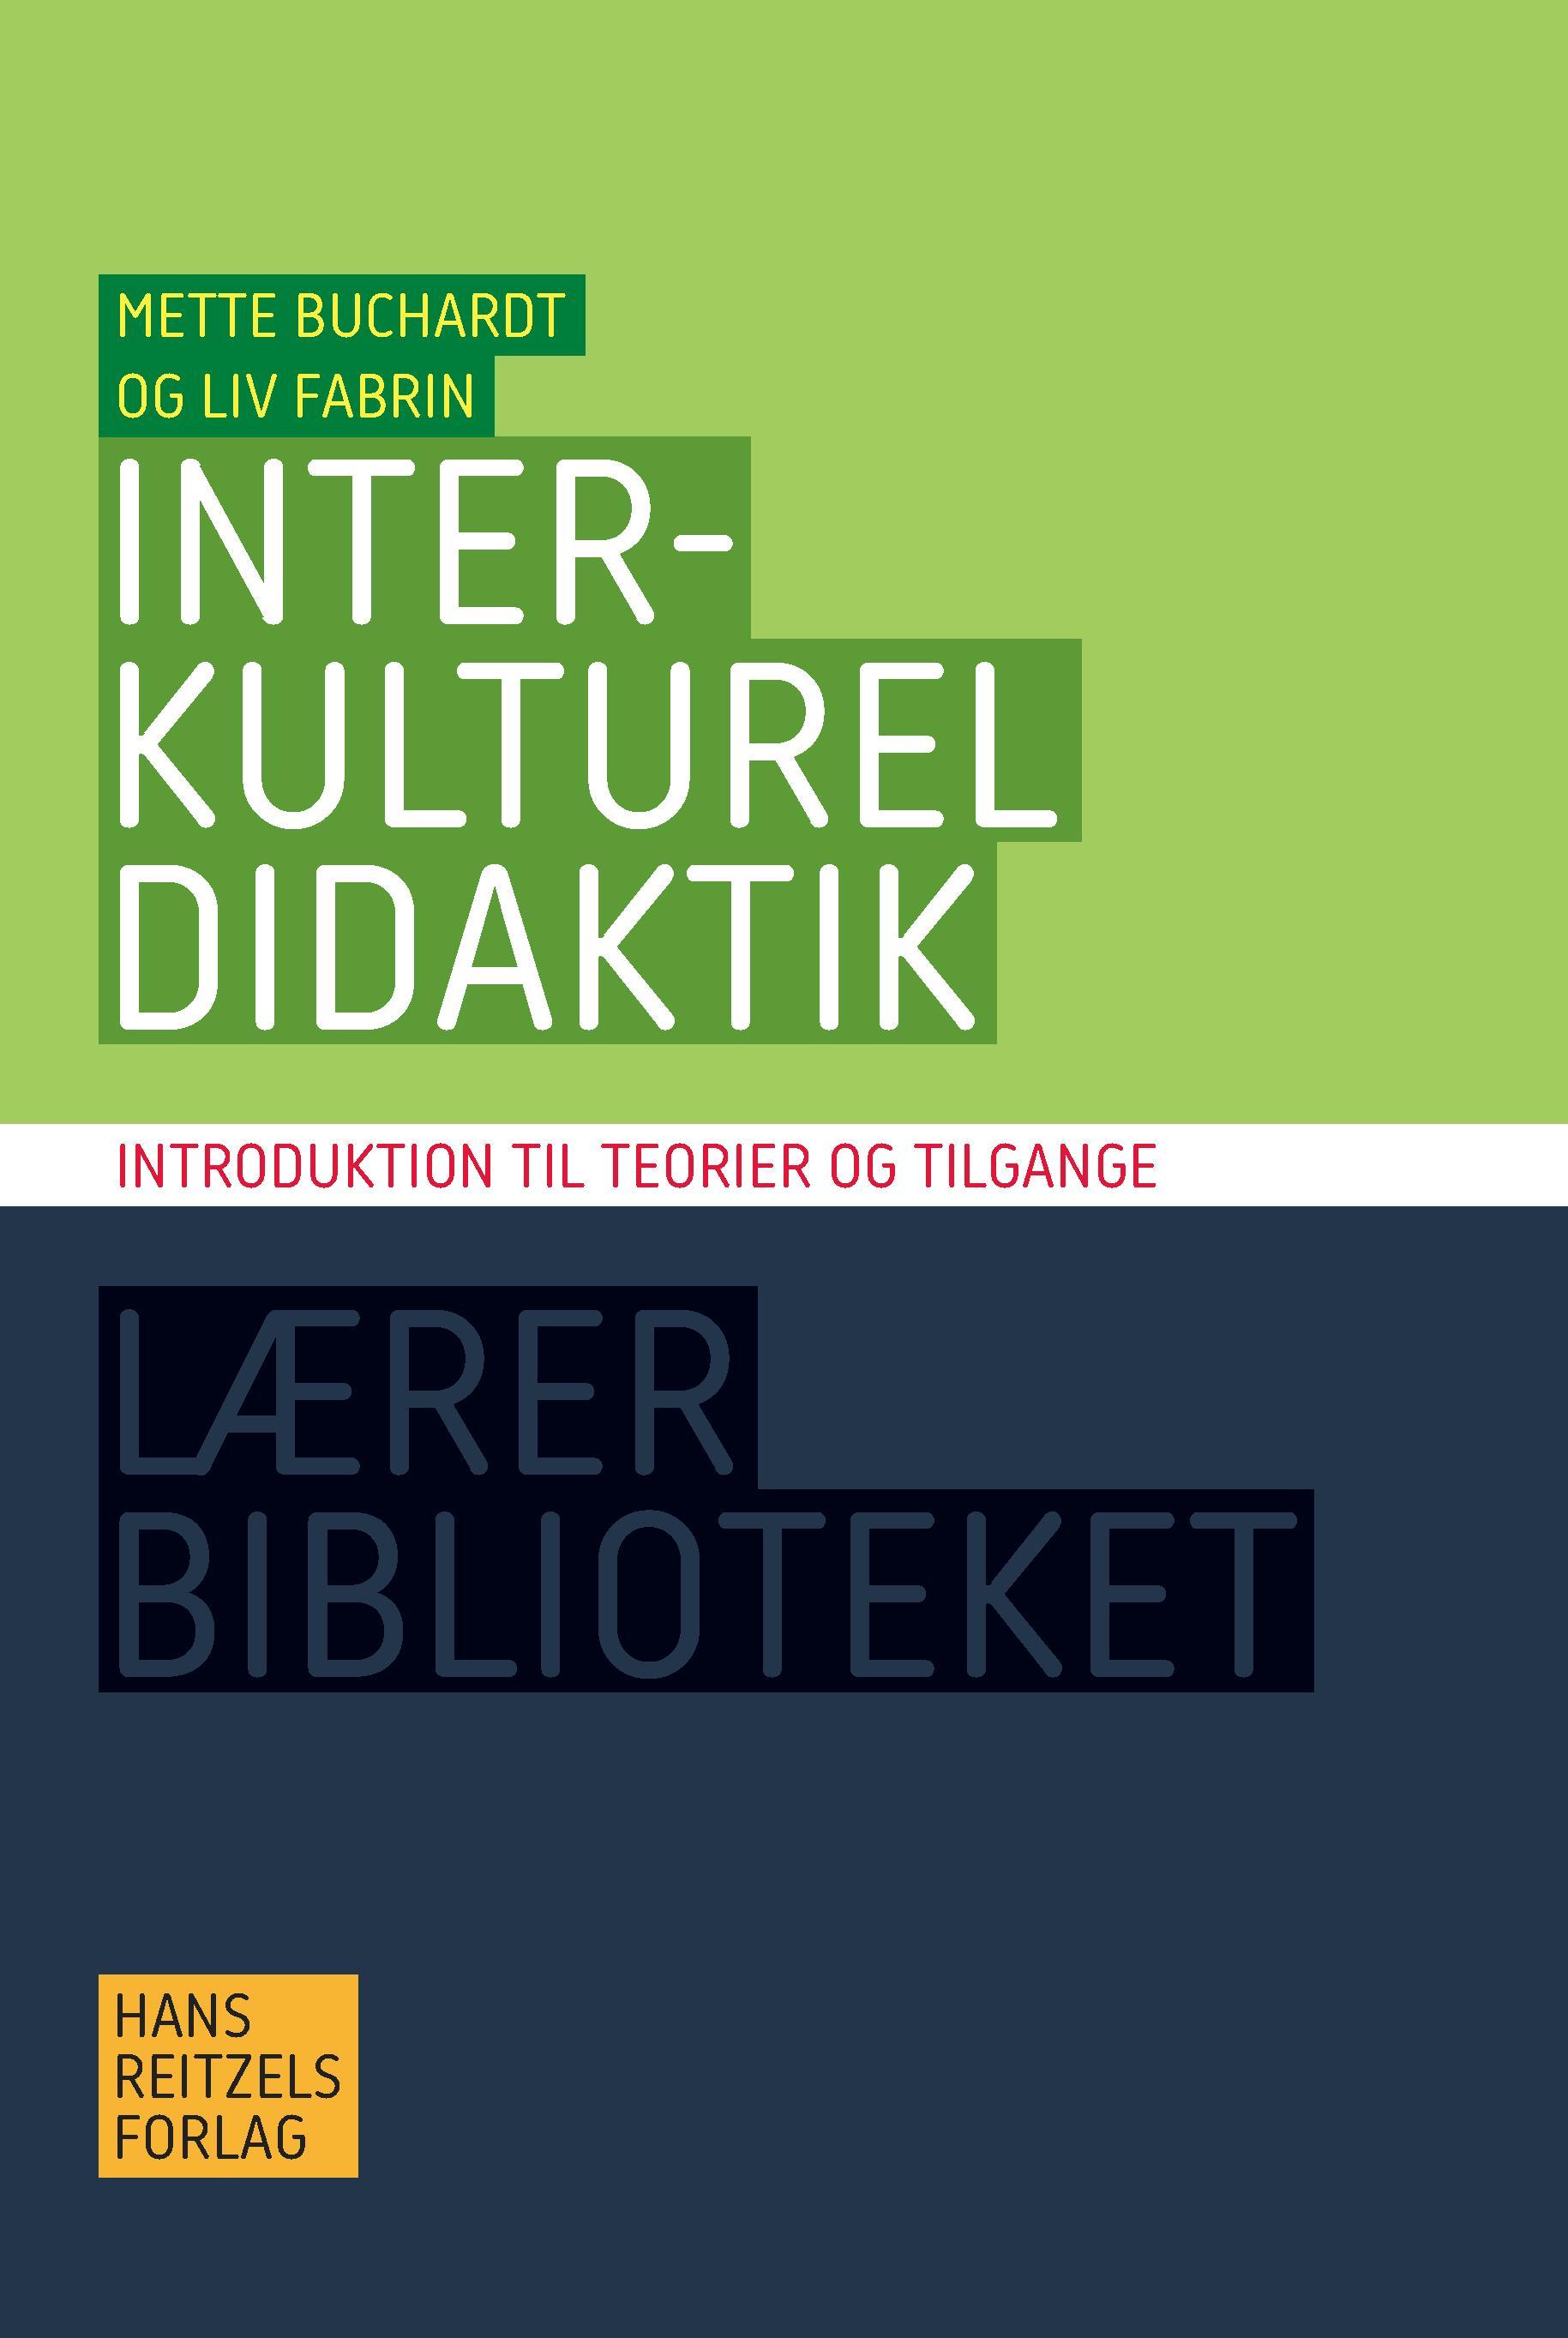 Interkulturel didaktik